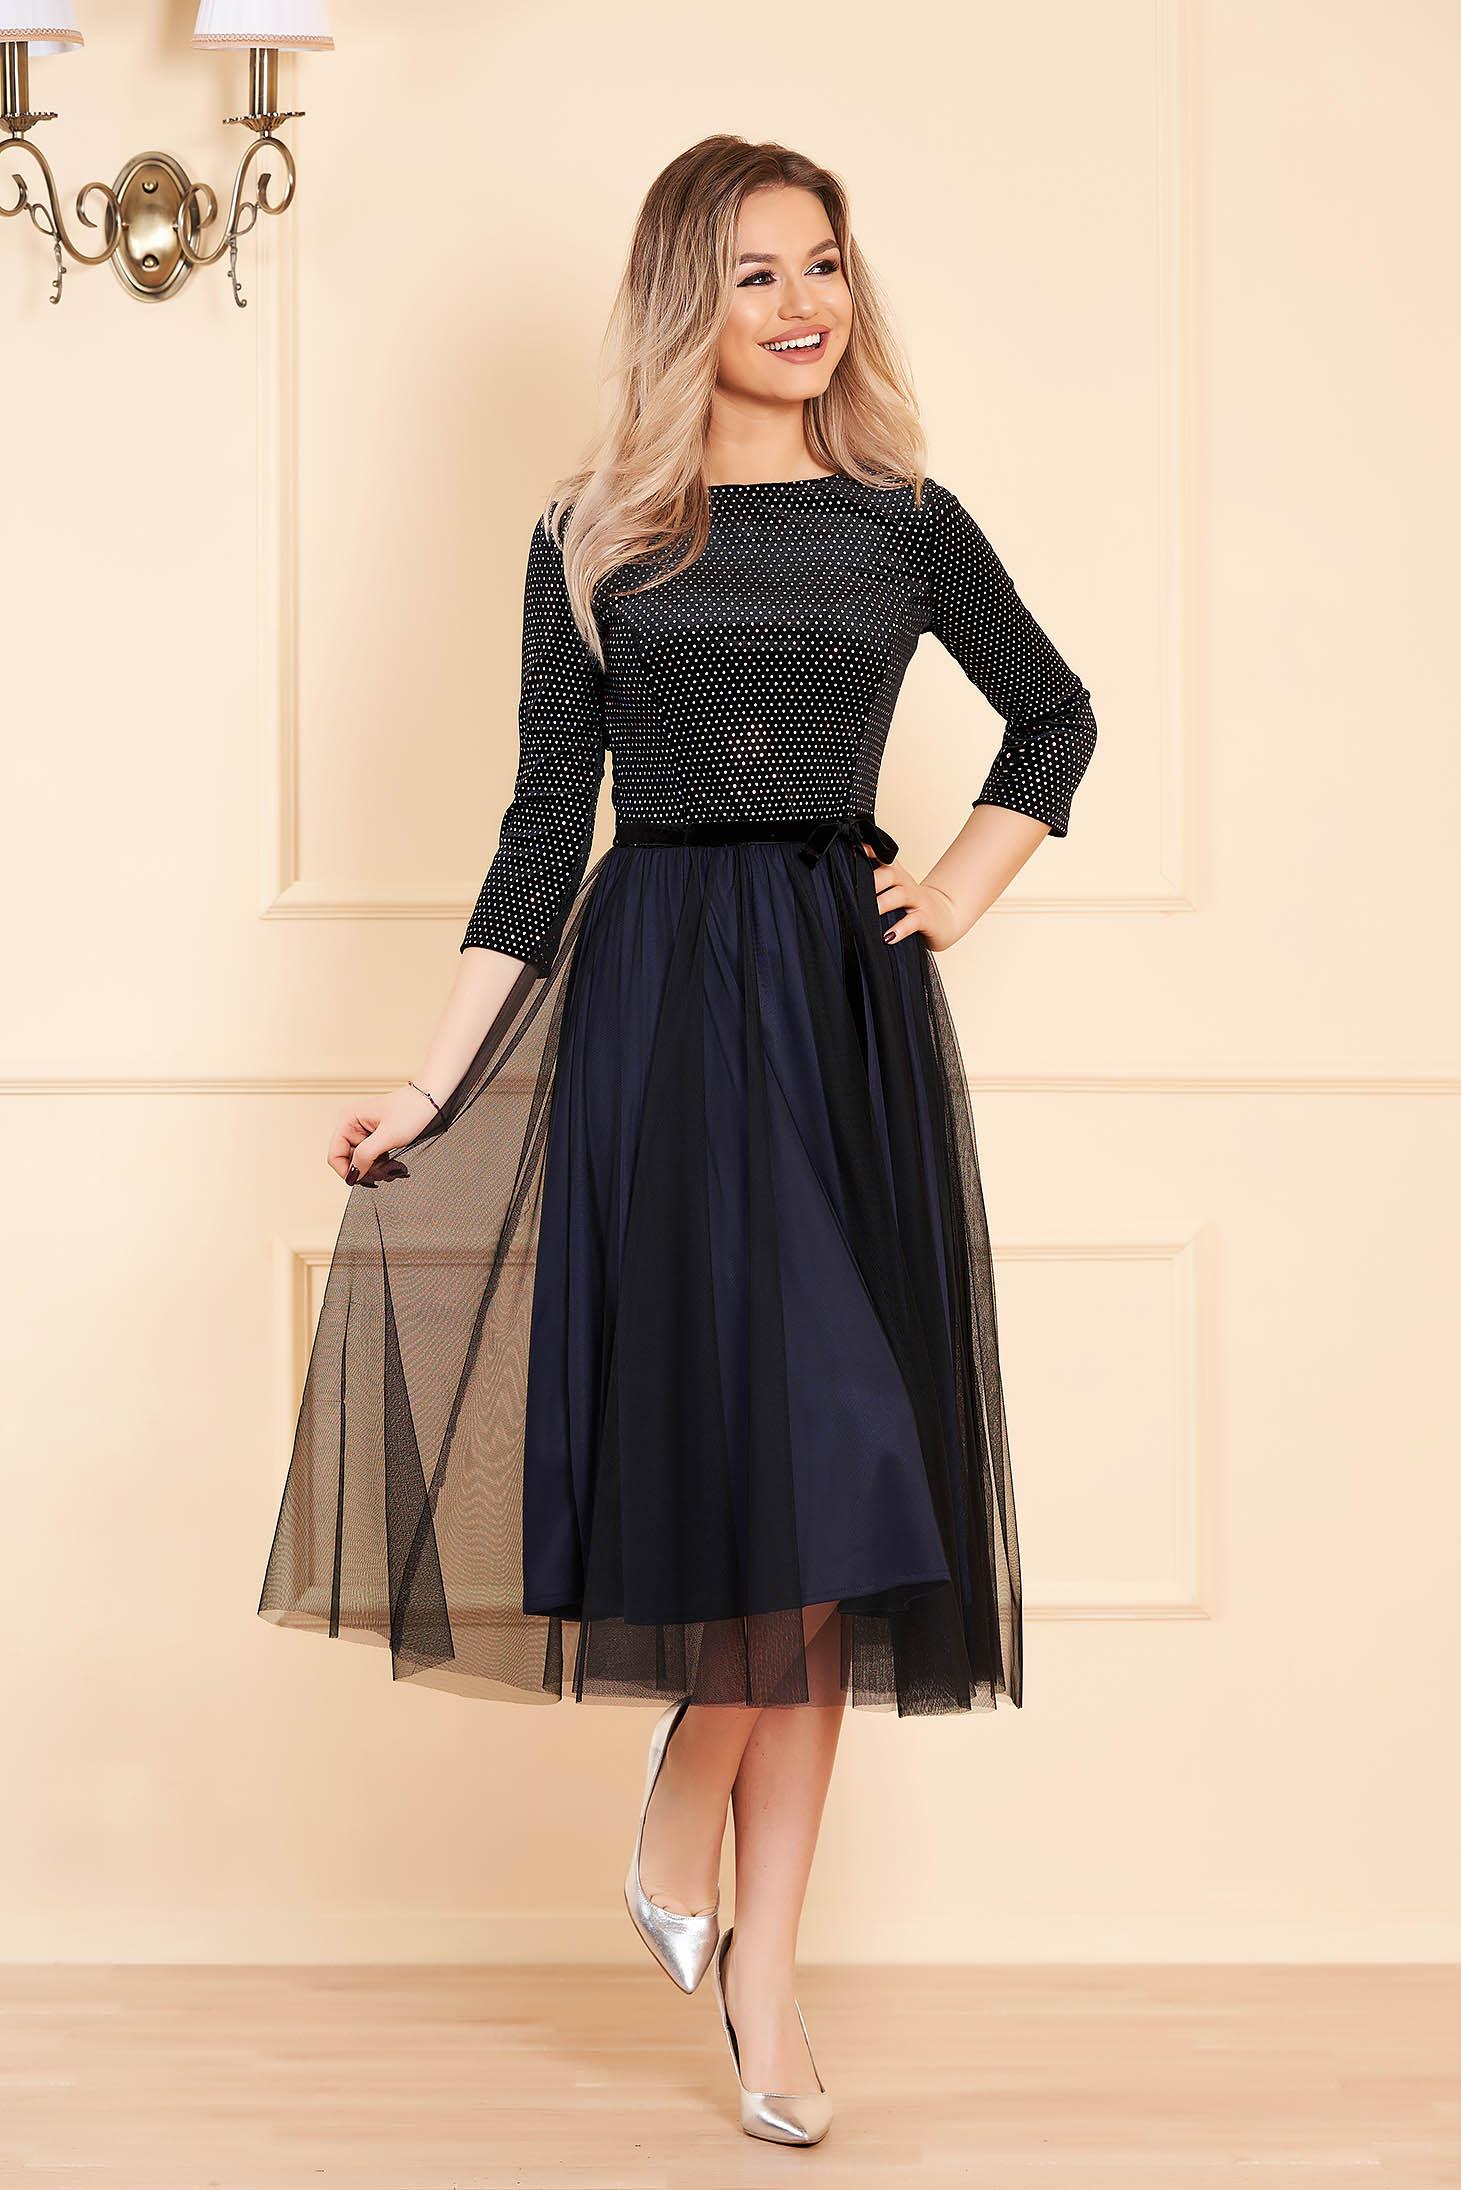 Dress StarShinerS black occasional 3/4 sleeve velvet from tulle flaring cut